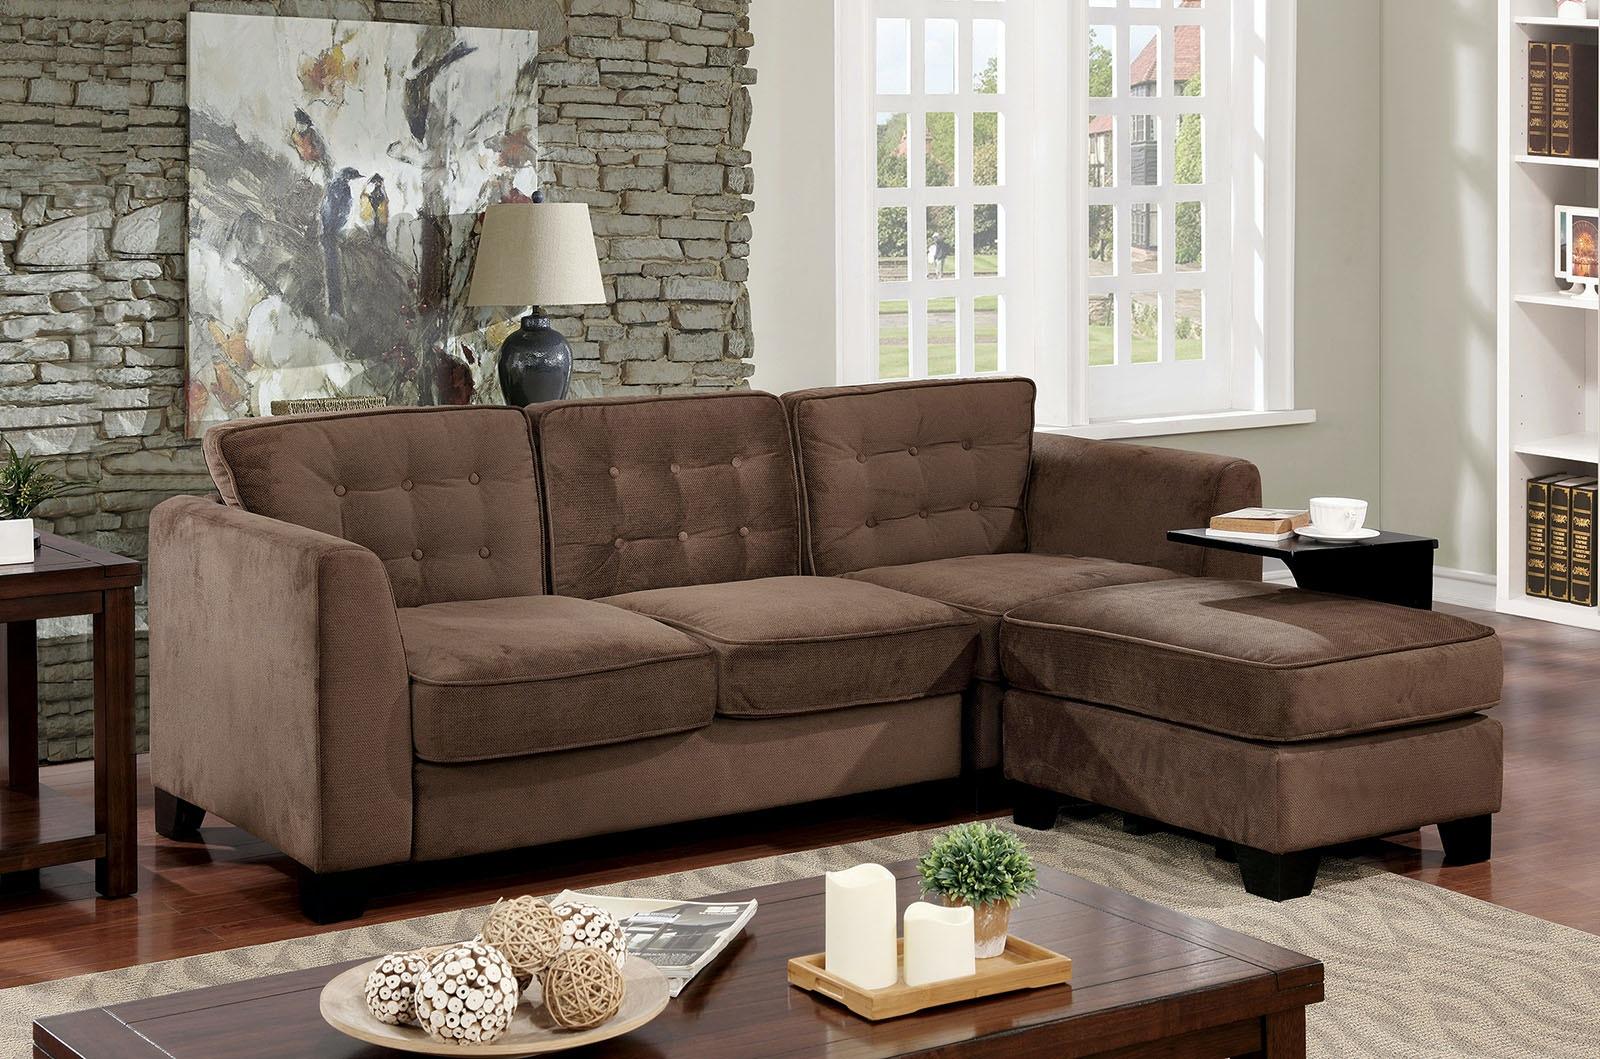 Furniture Of America Sofa + Ottoman + Side Table CM6862 SET